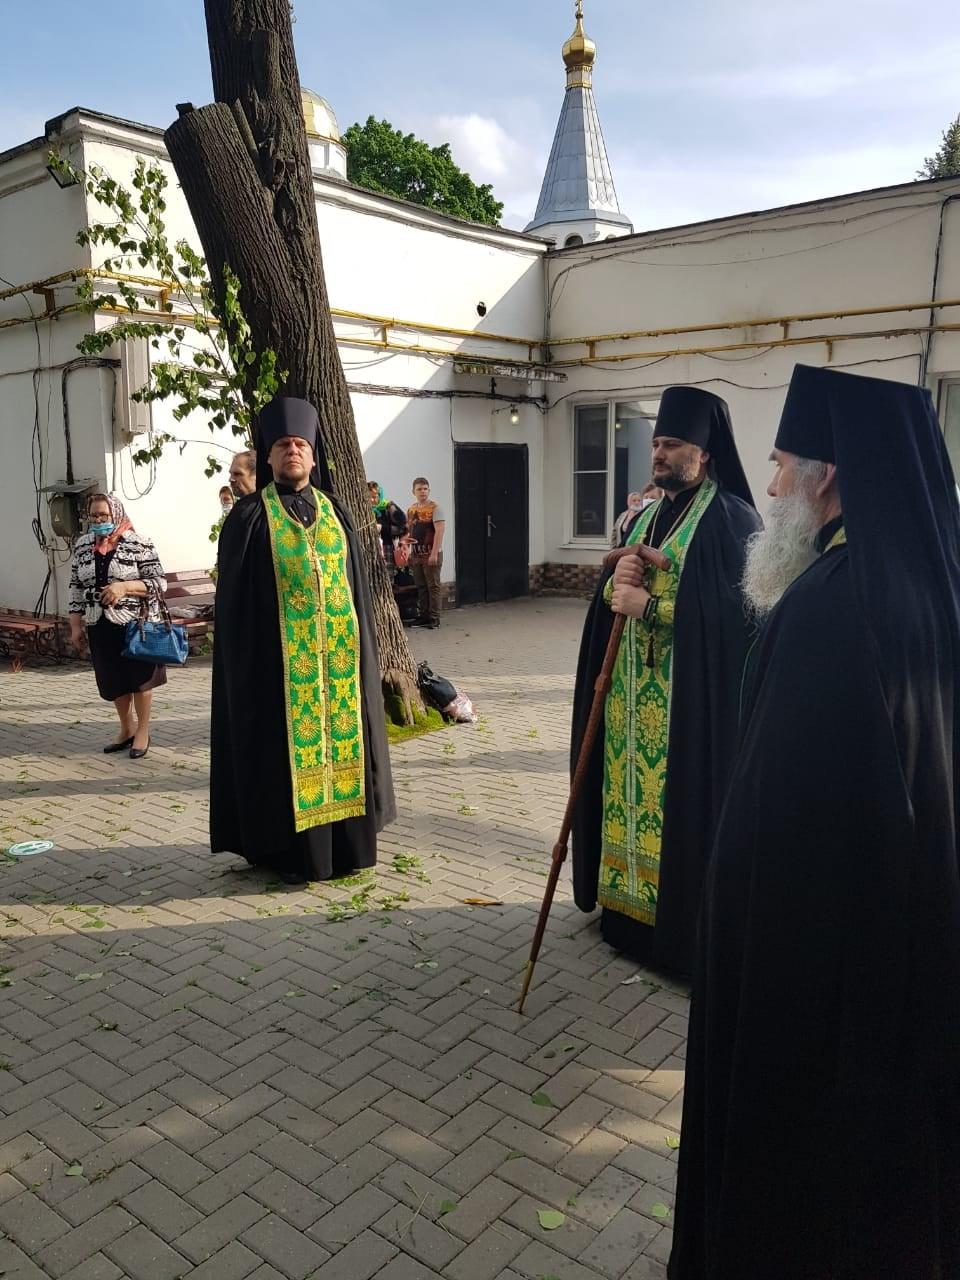 http://monuspen.ru/photoreports/2817cad3255237dbc1f34838a51bcd81.jpeg